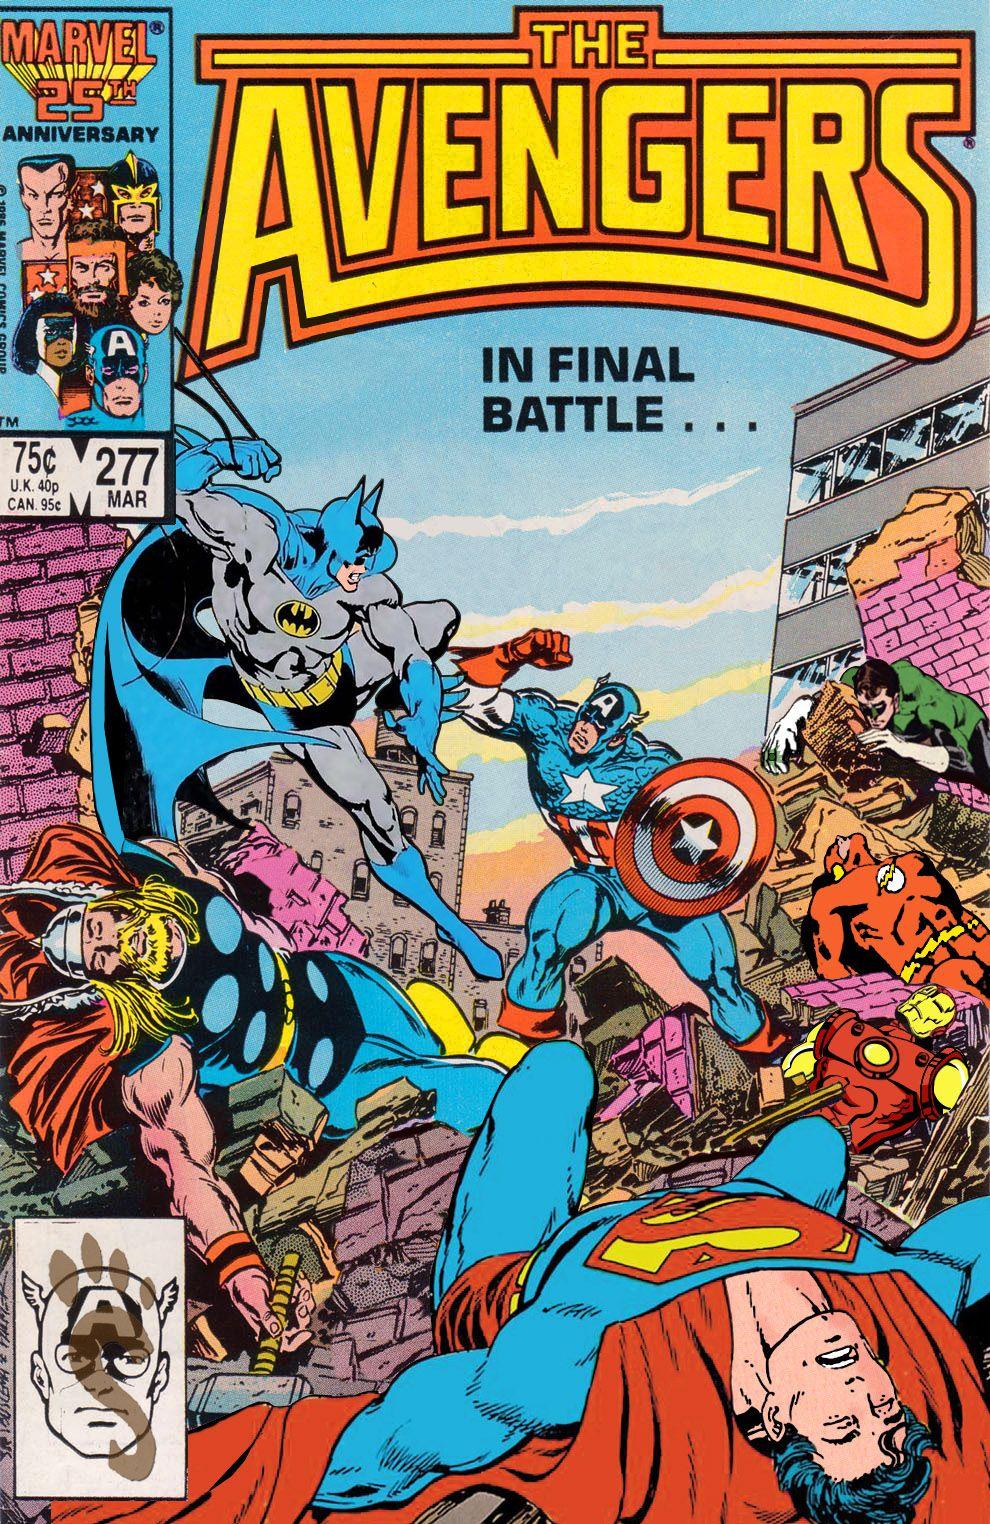 Avengers Vs Justice League Dc Comics Vs Marvel Batman Vs Captain America Avengers Vs Justice League